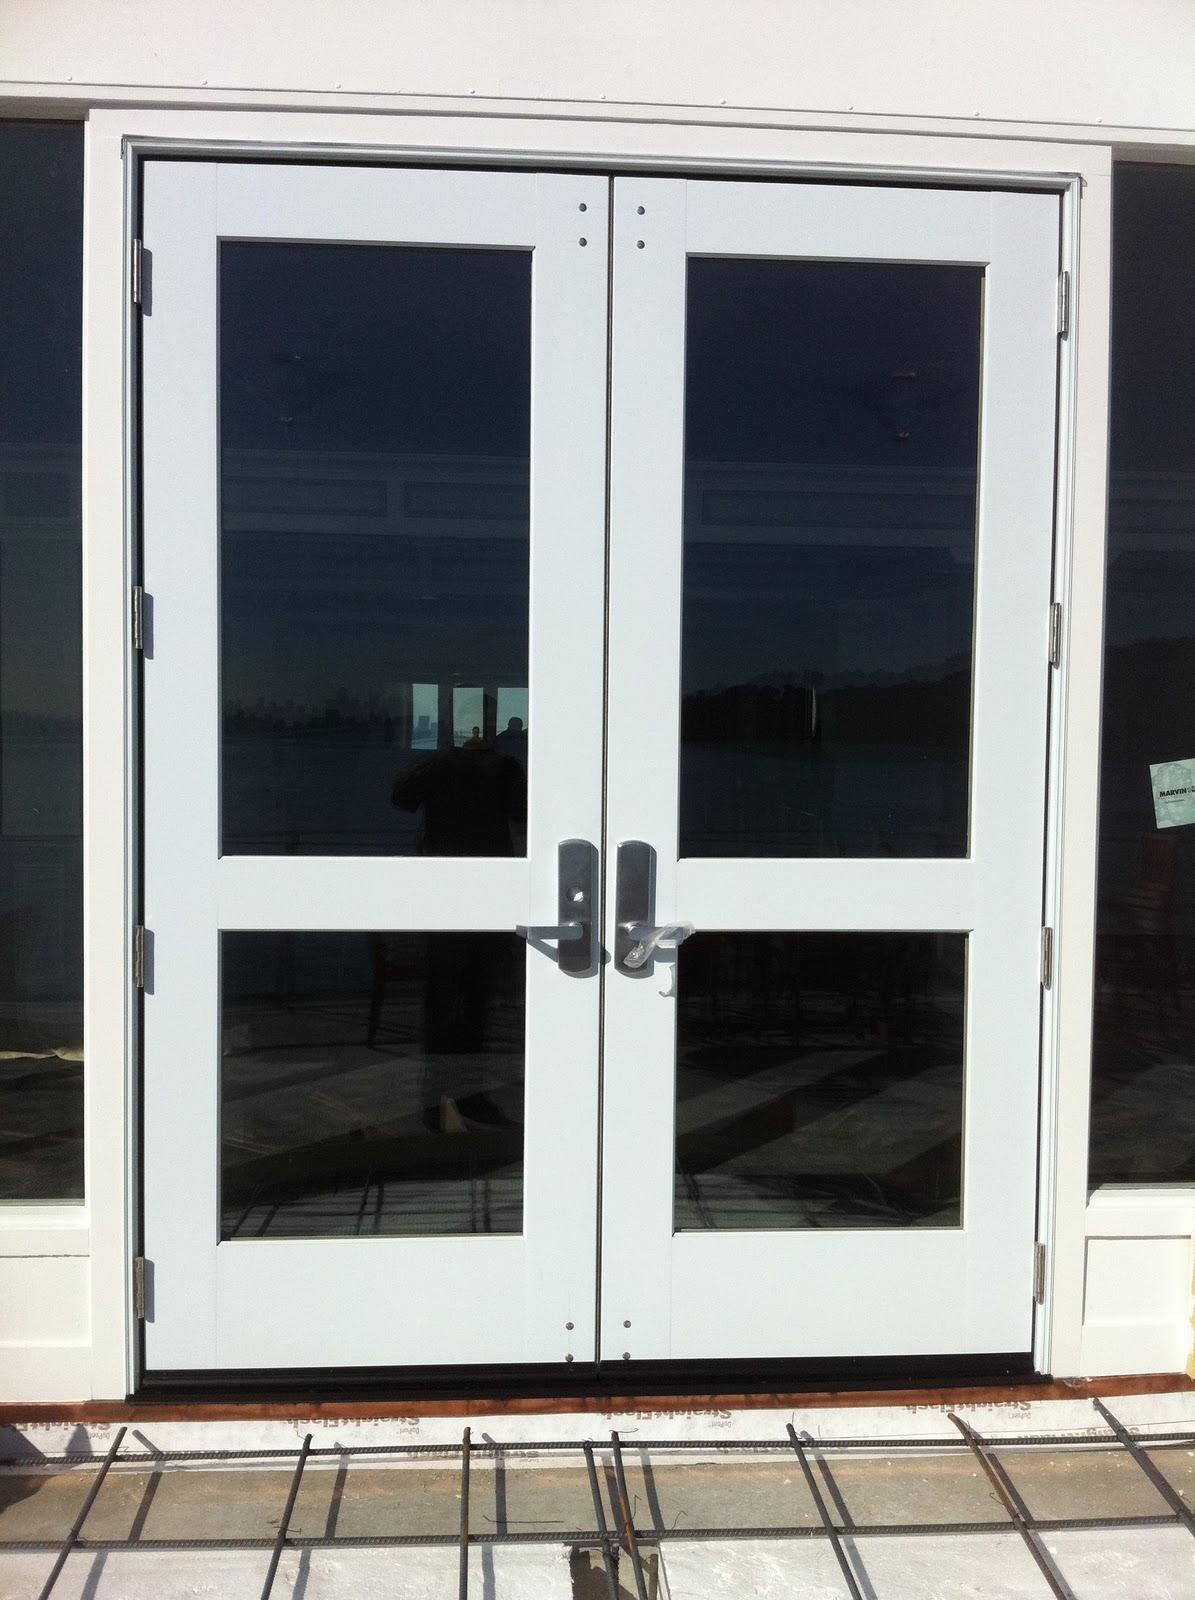 Marvin Commercial Door Installation with Von Duprin Hardware